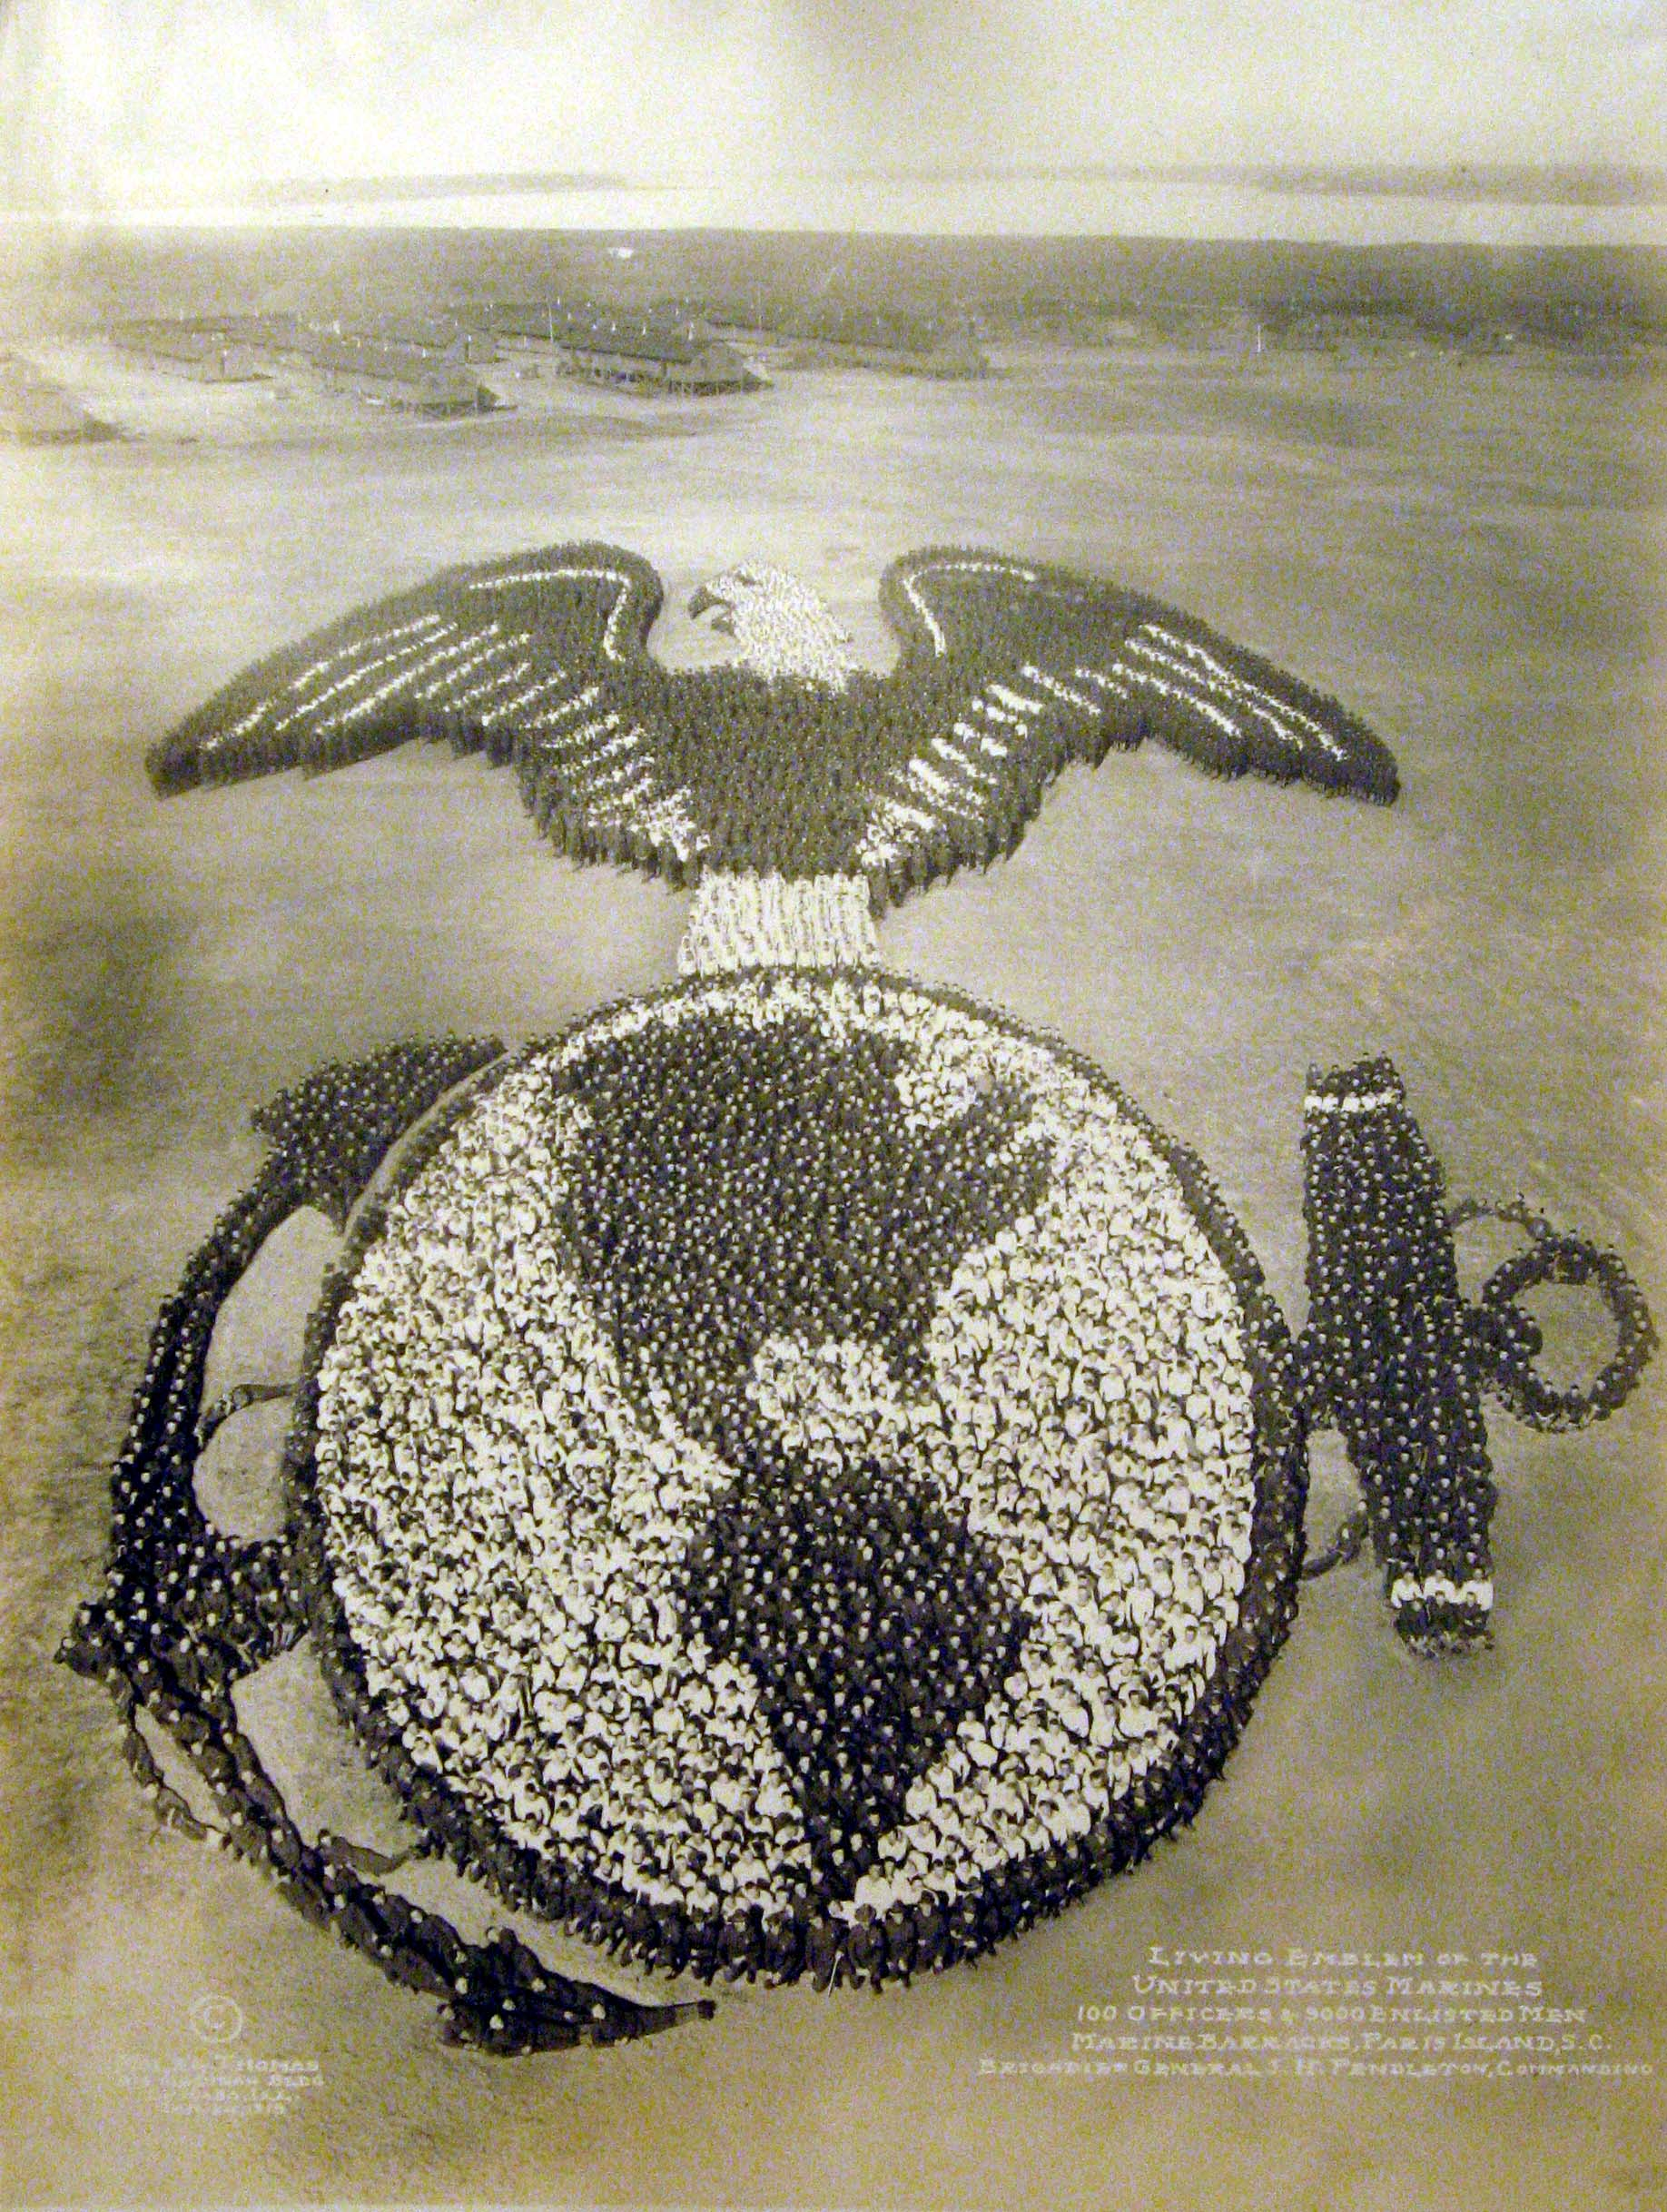 Thomas-Mole-Living_Emblem-1919-USMC